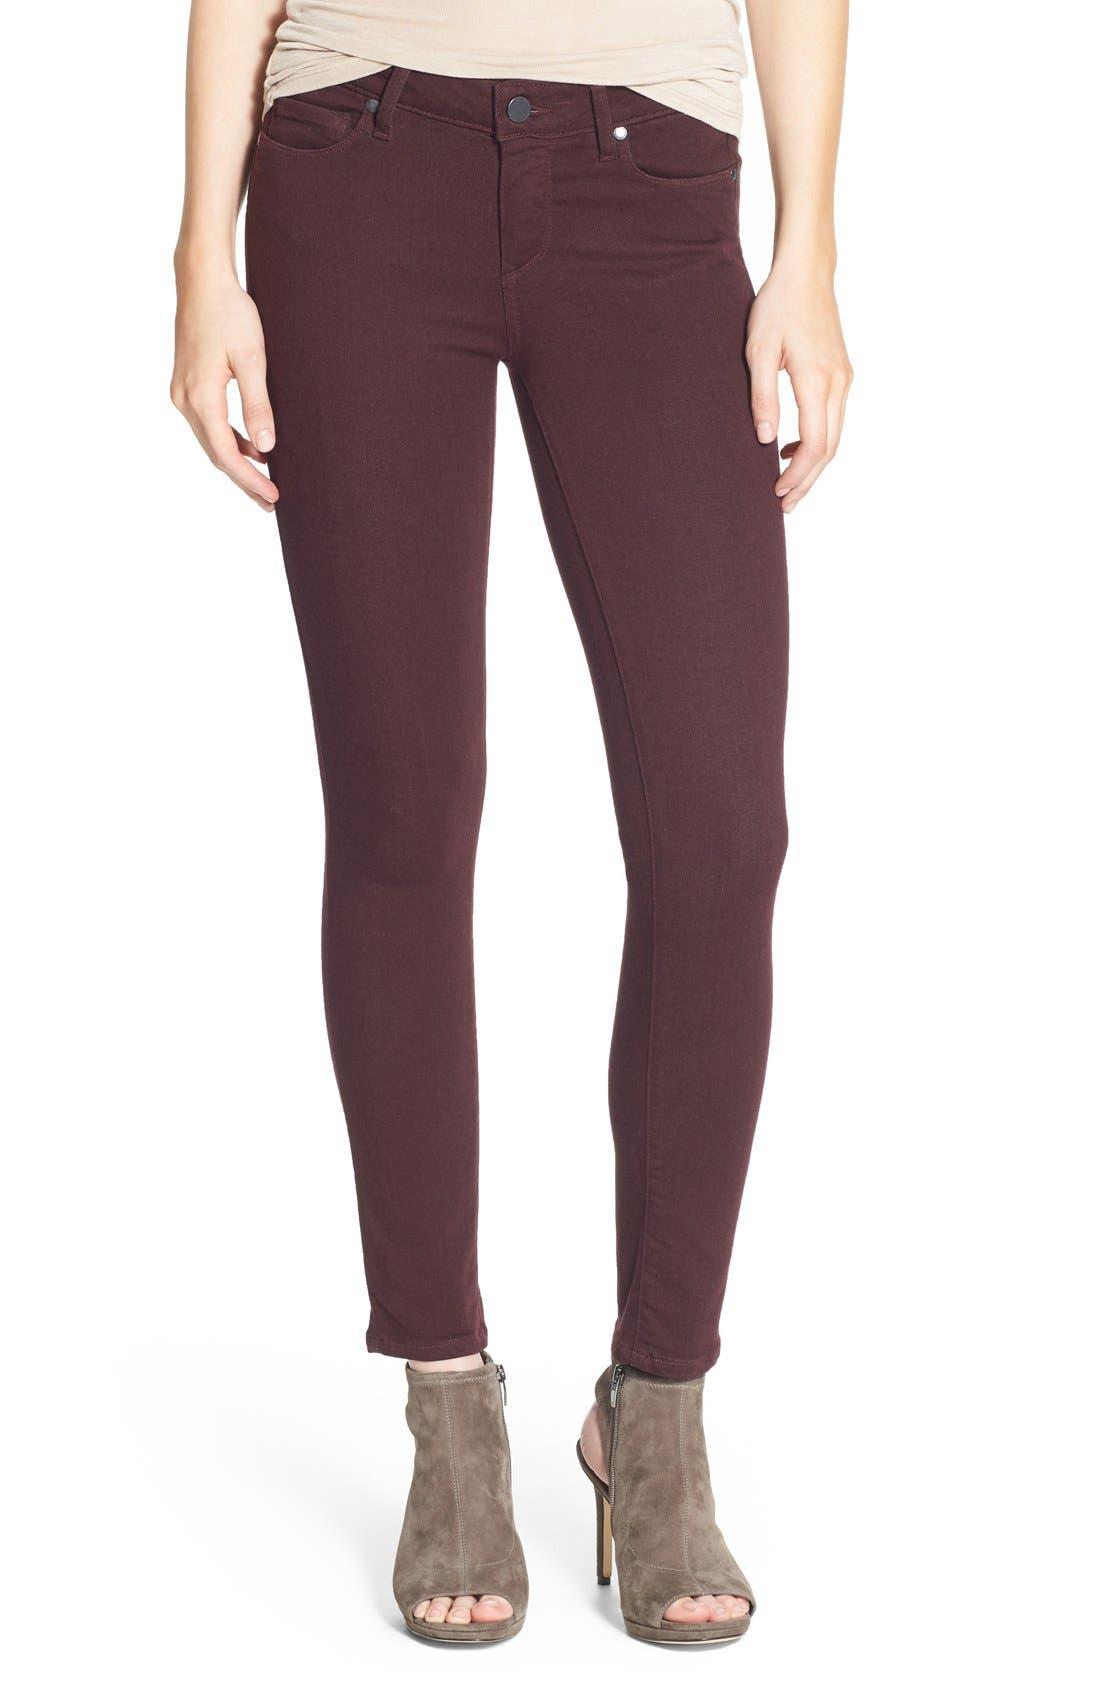 Main Image - PAIGE 'Verdugo' Ankle Skinny Jeans (Aubergine)